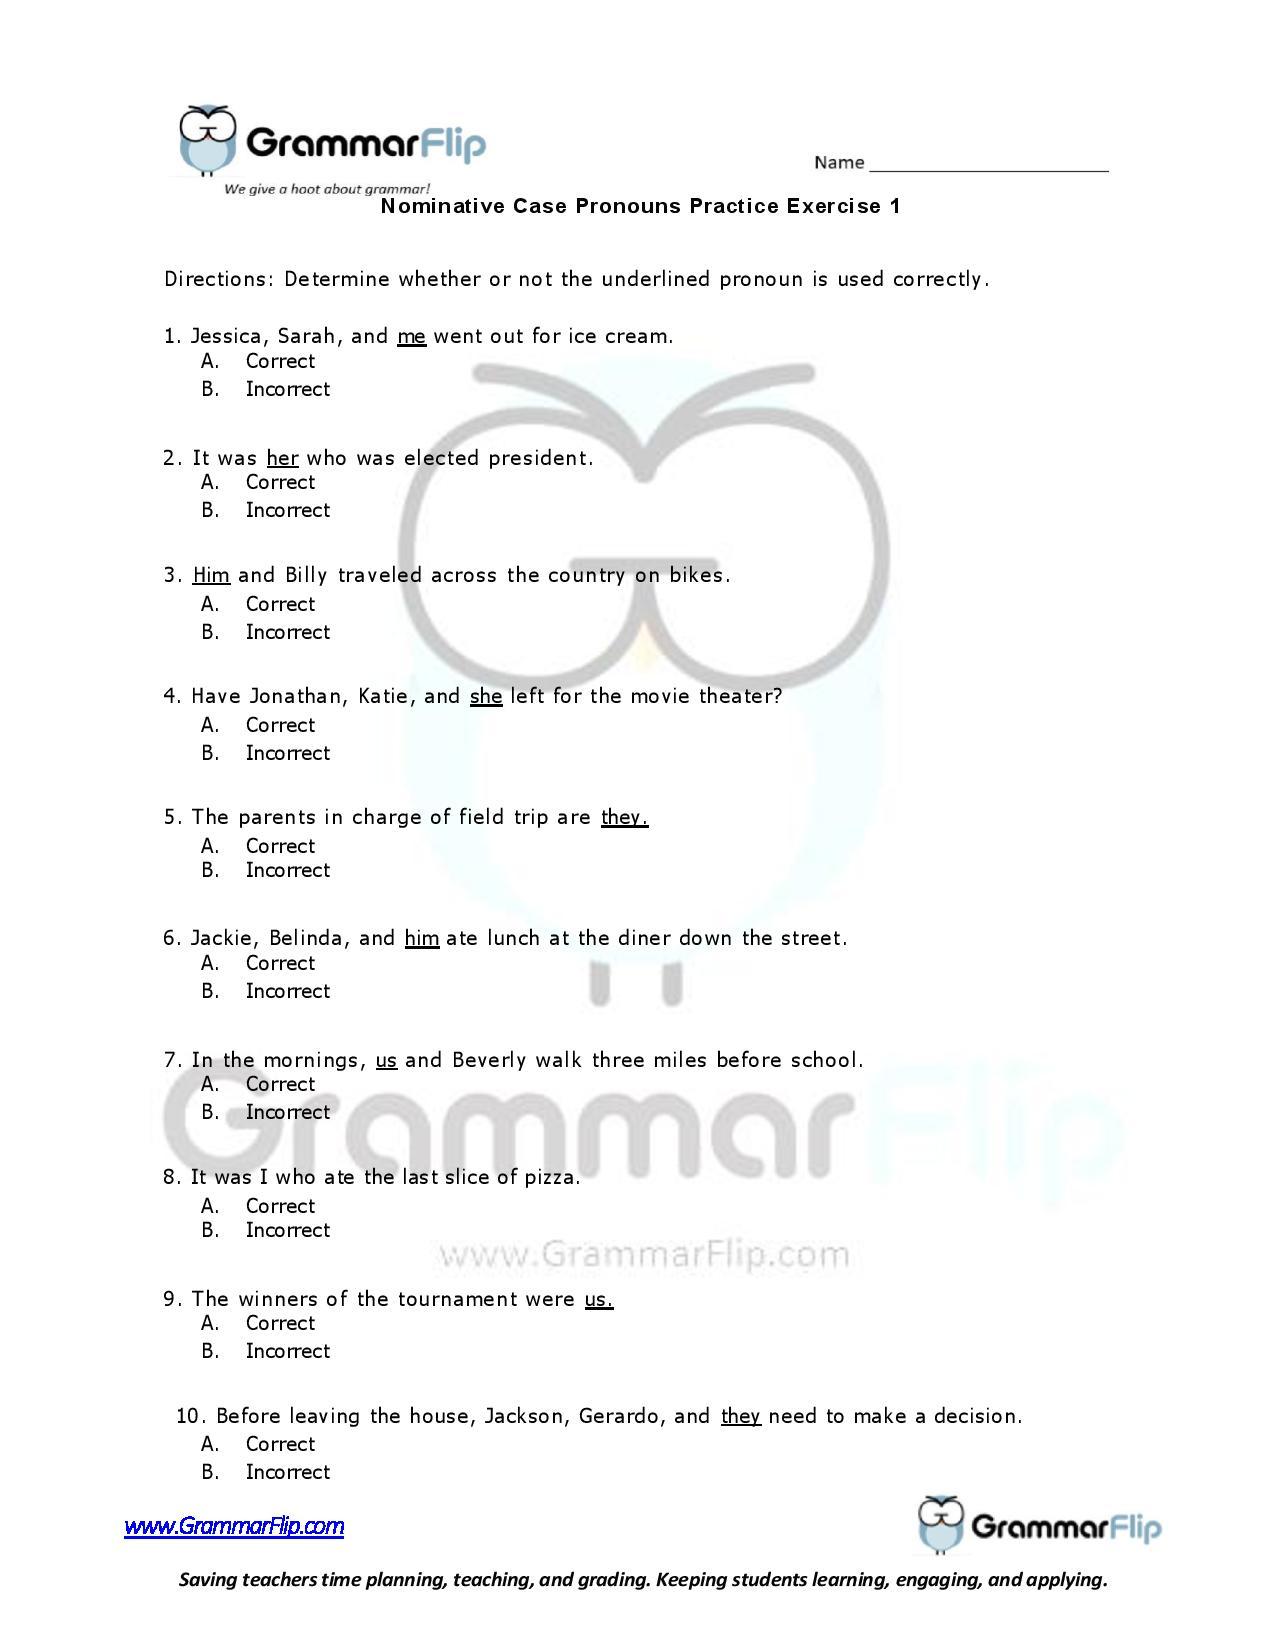 Nominative Case Pronouns